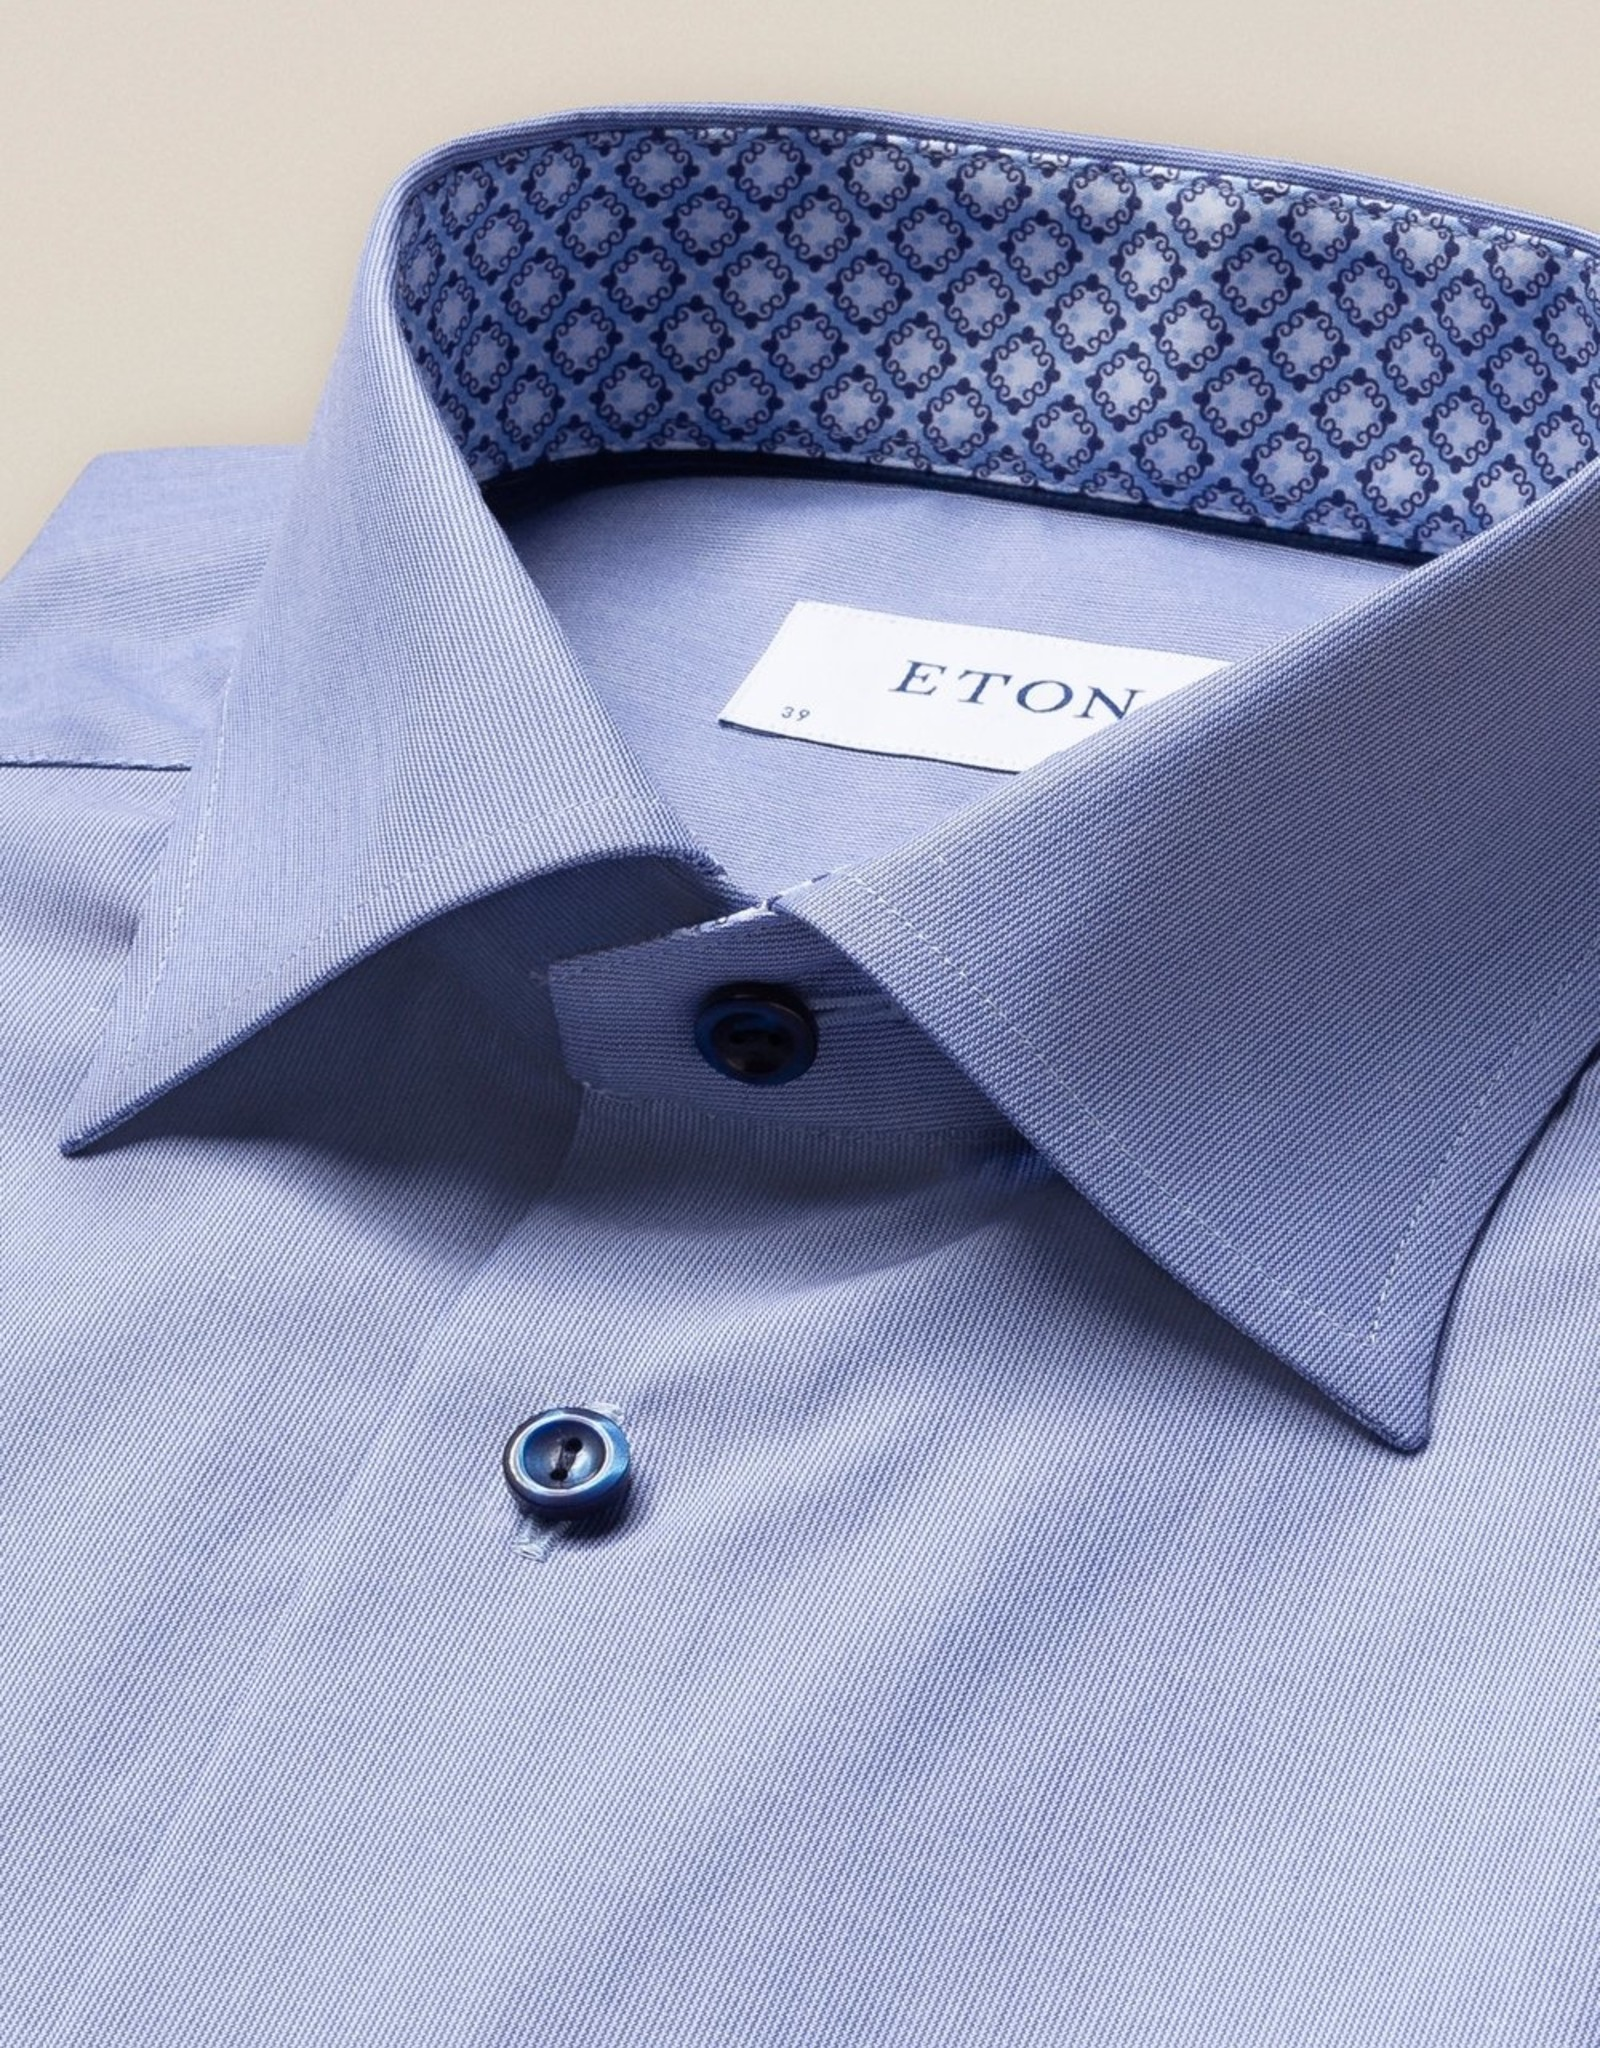 Eton Hemd blauw gestreept Eton